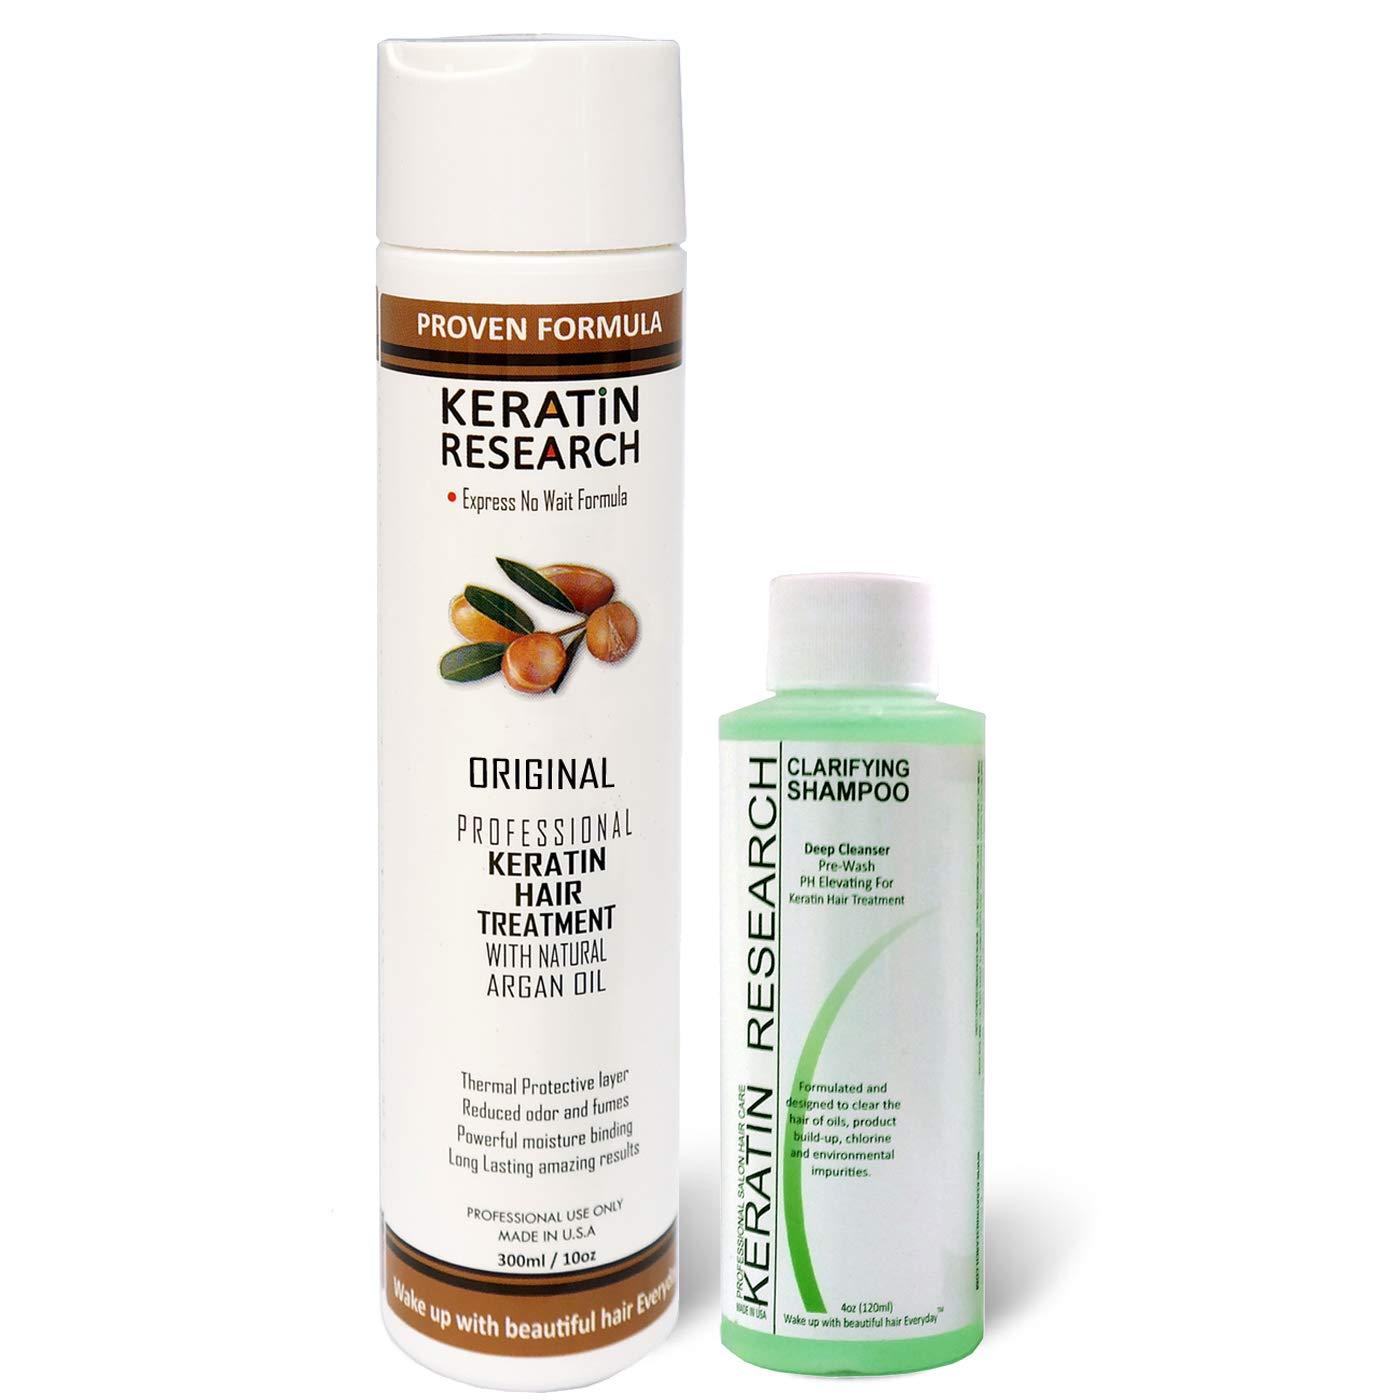 Brazilian Professional Keratin Hair Blowout Treatment with Clarifying Shampoo Voted Best By Keratin Research Queratina Keratina Brasilera Tratamiento